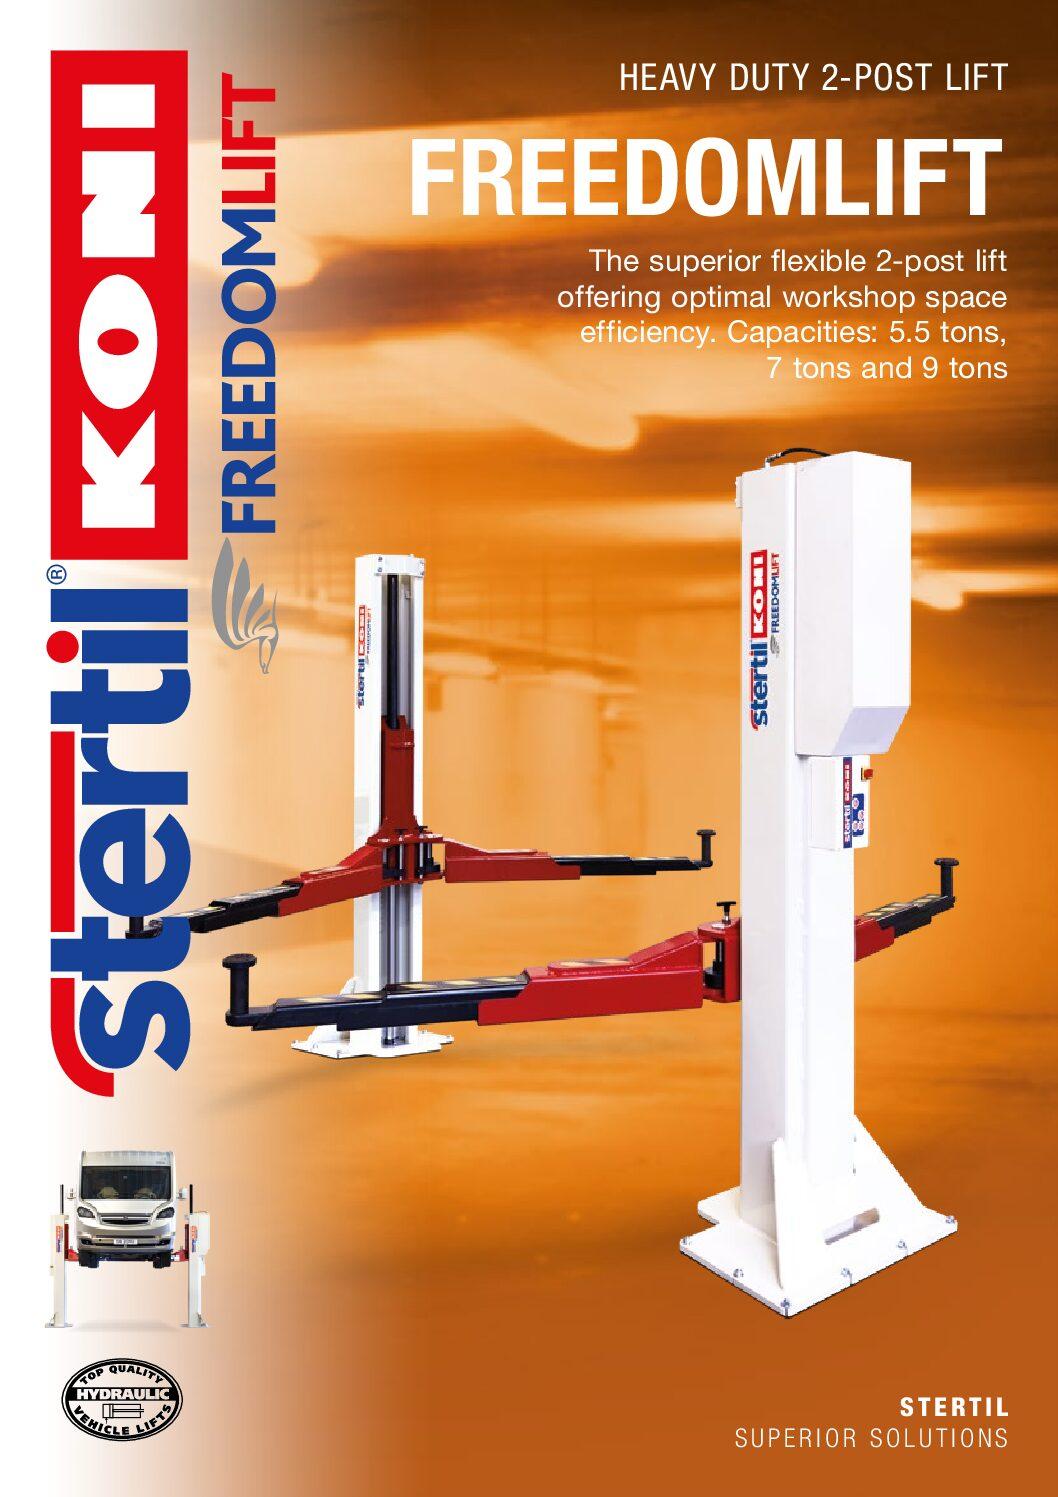 Stertil-Koni: FREEDOMLIFT – GB Version